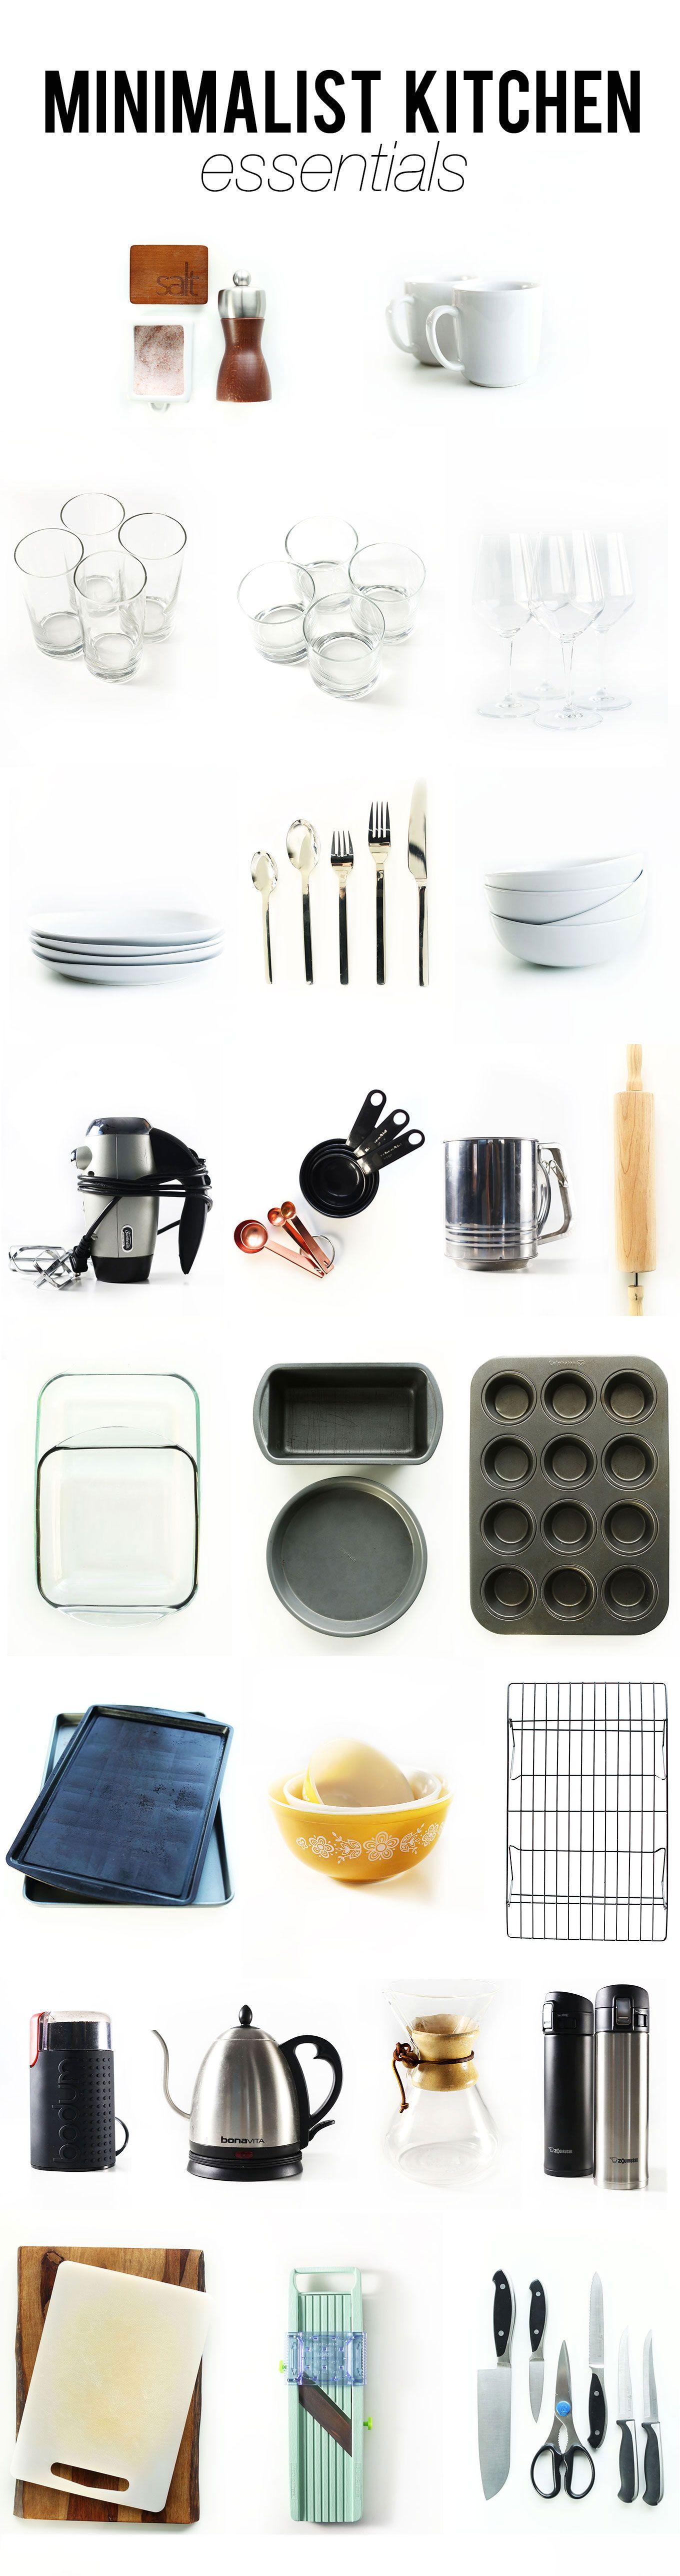 Uncategorized Necessary Kitchen Appliances 45 essential kitchen tools and appliances every must minimalist essentials minimalistbaker com